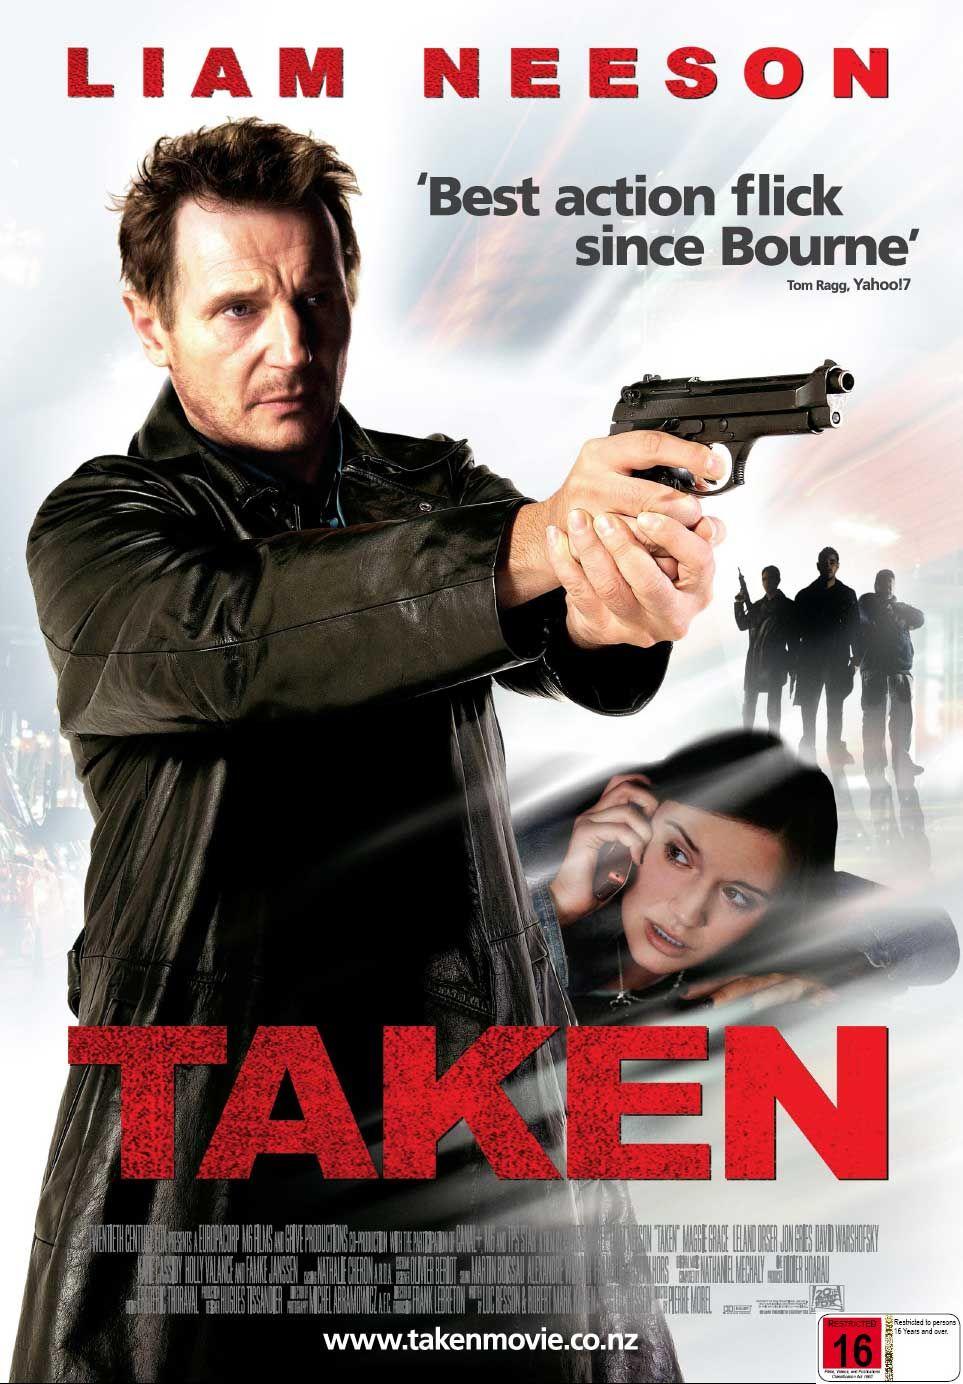 The 'Taken' movie poster